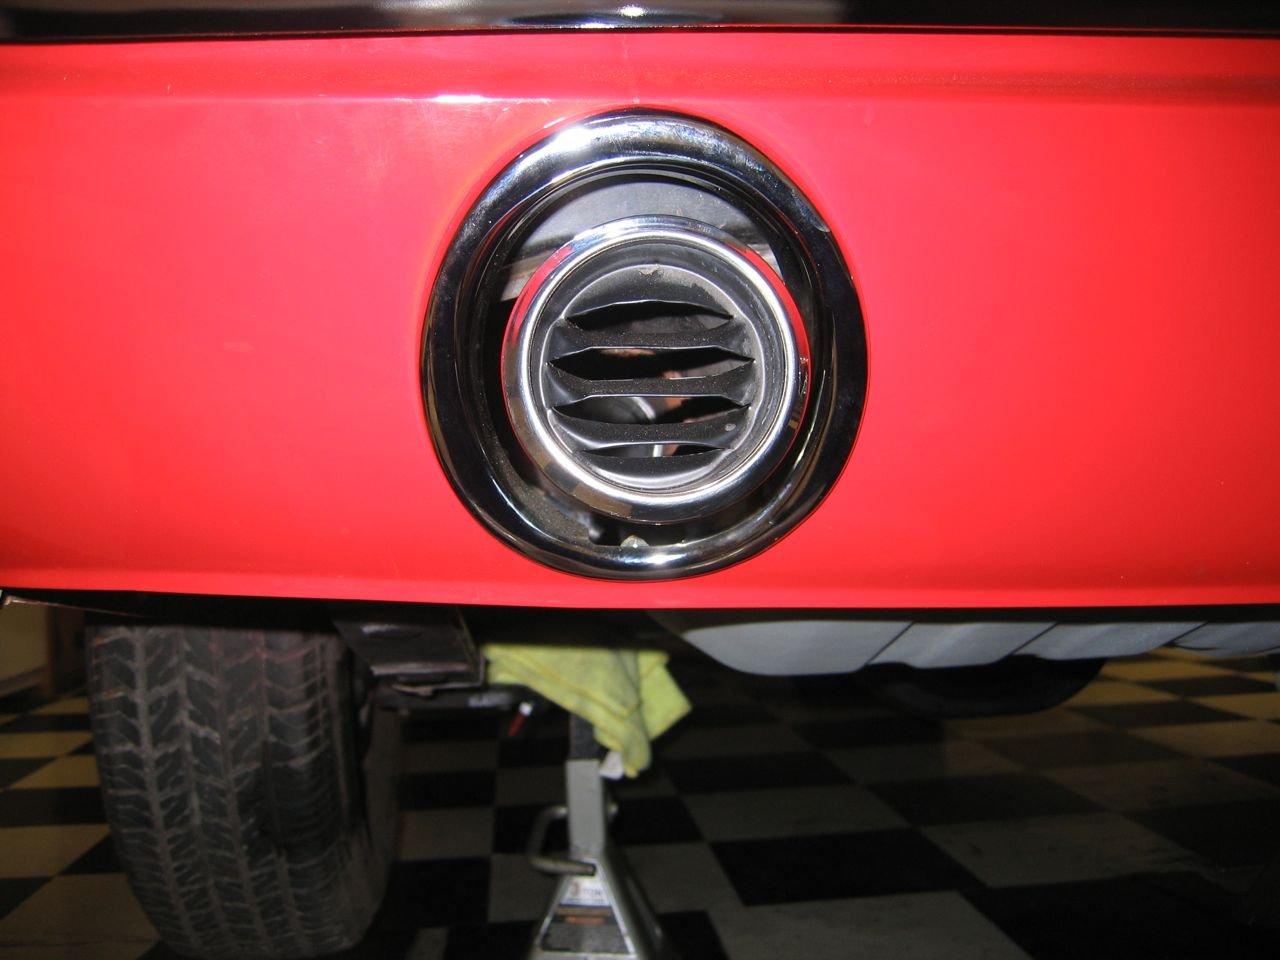 04 Mustang Gt >> 1965 Mustang GT Exhaust Tips - Ford Mustang Forum